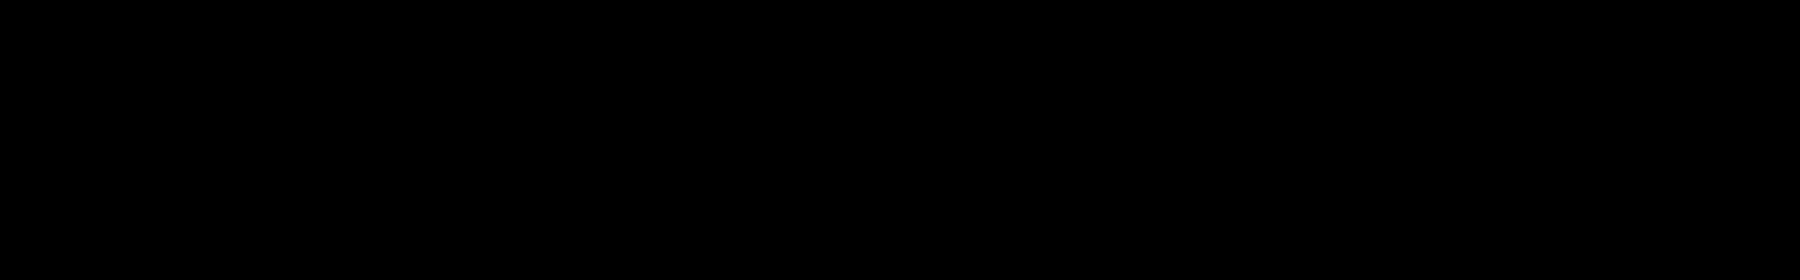 Dubstep Loopz audio waveform